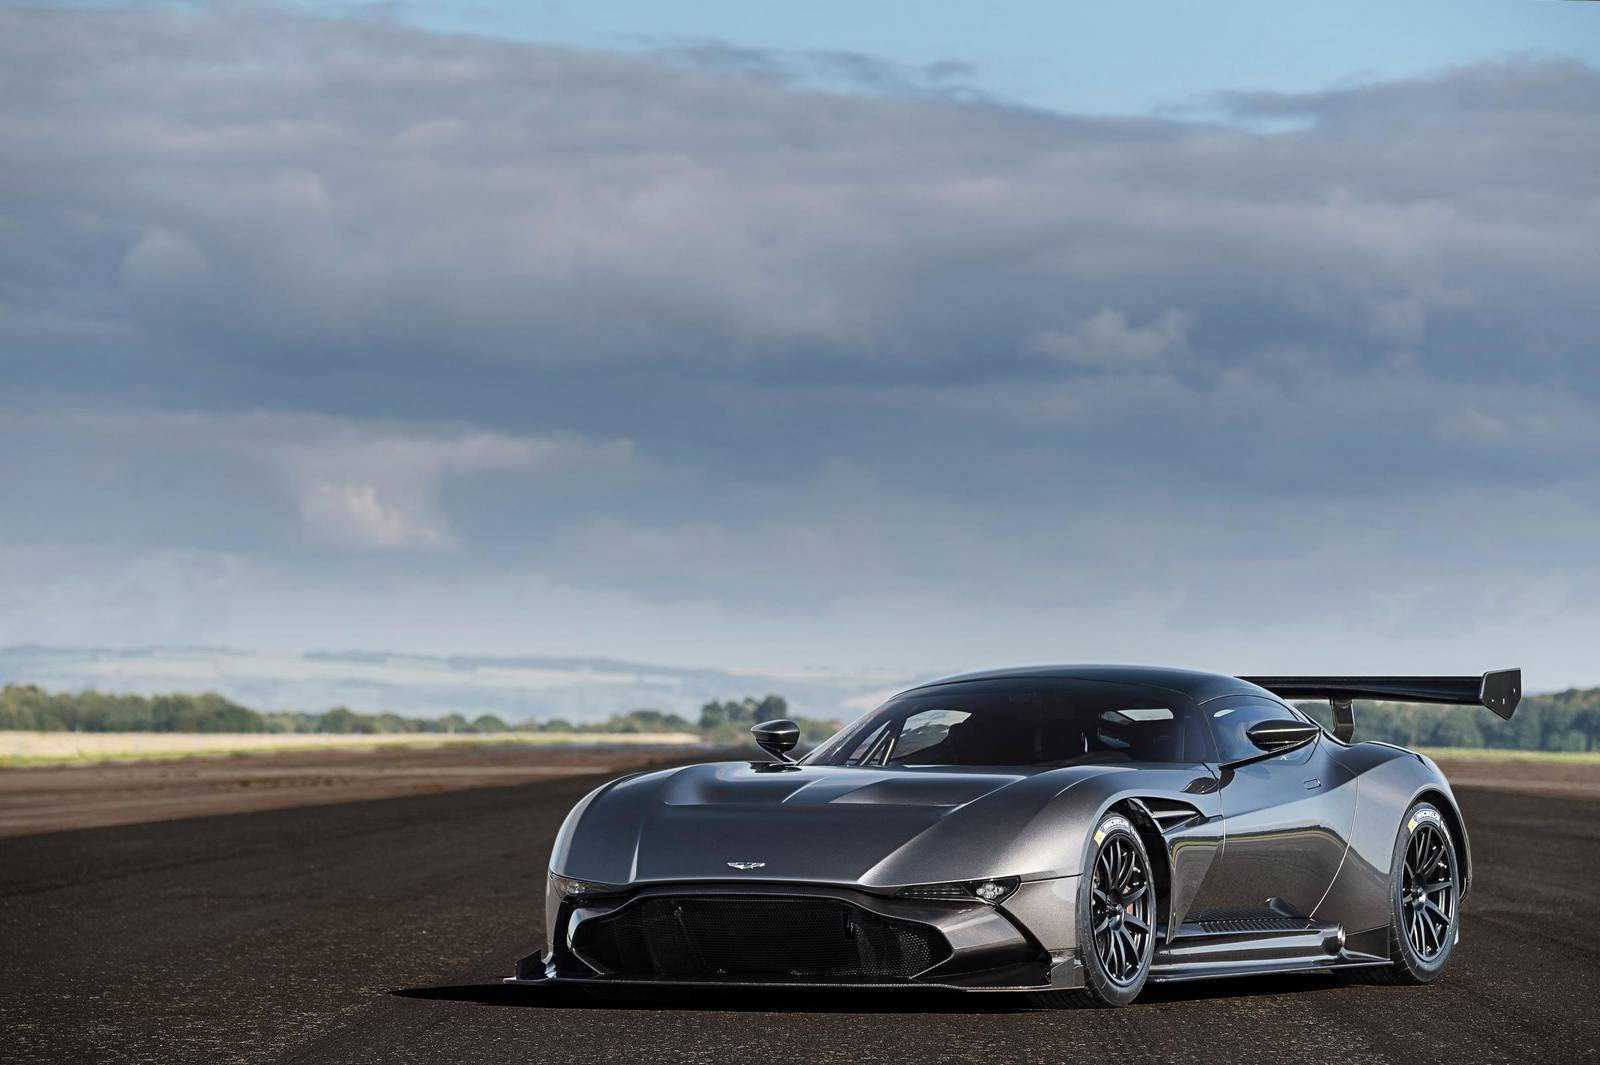 Aston Martin Vulcan суперкар без смс